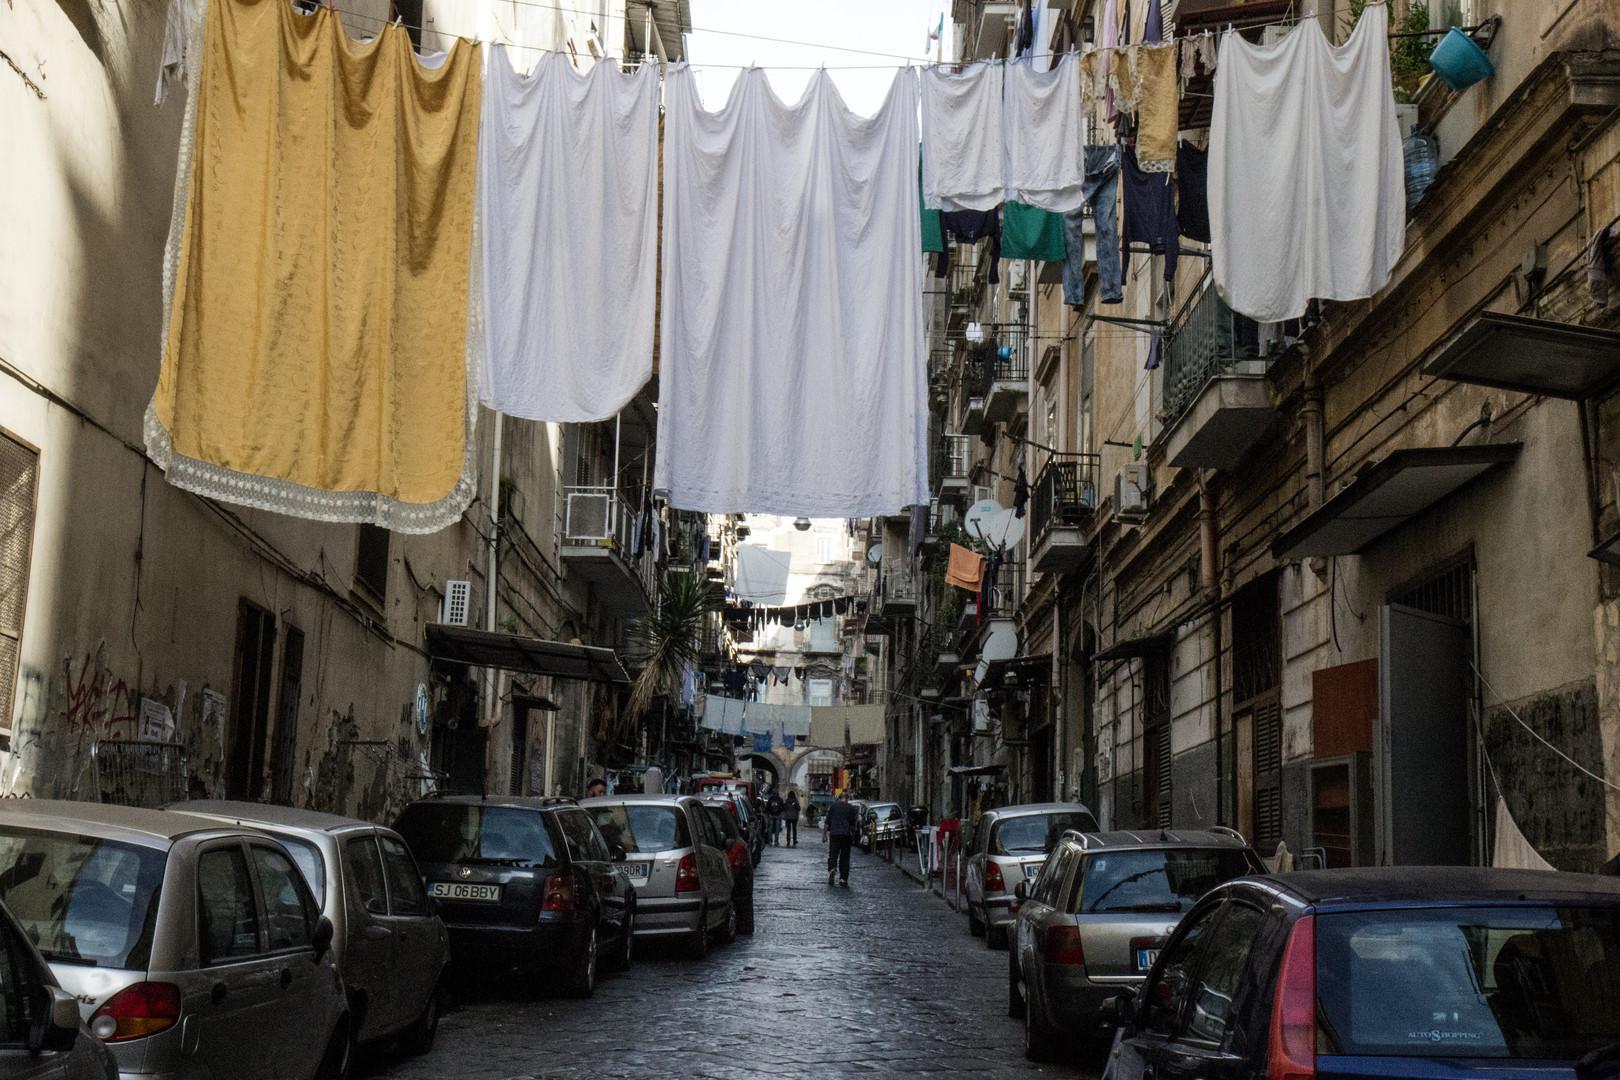 Napoli Old Town - Italy